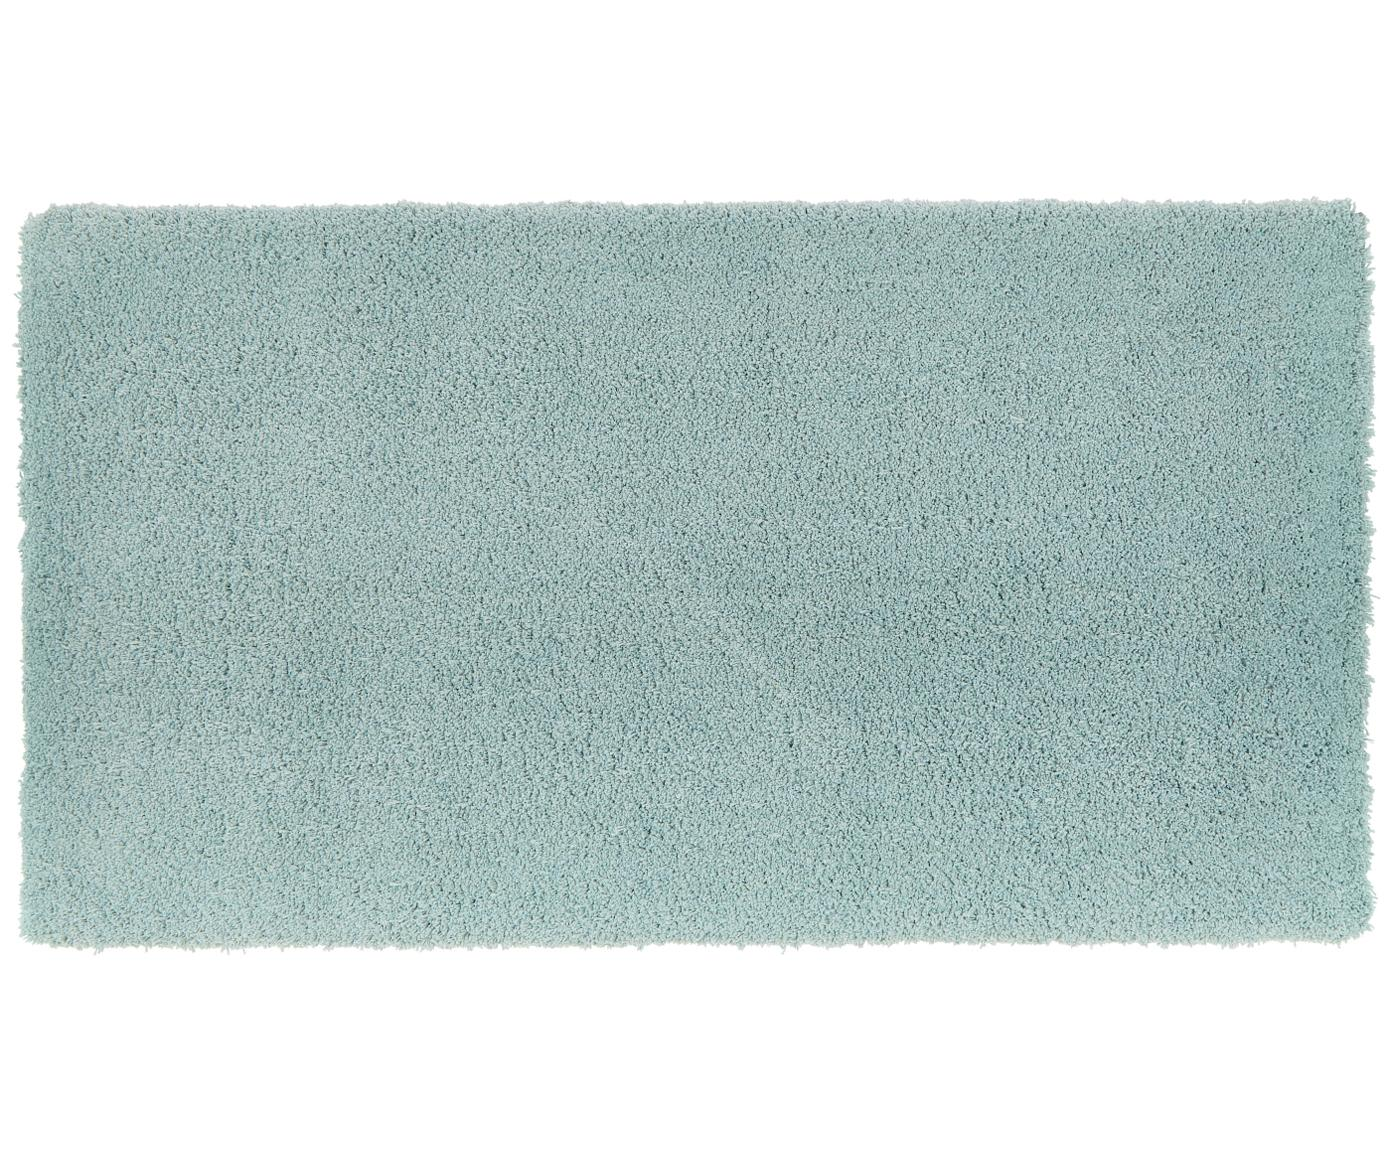 Flauschiger Hochflor-Teppich Leighton in Mintgrün, Flor: 100% Polyester (Mikrofase, Mintgrün, B 80 x L 150 cm (Grösse XS)